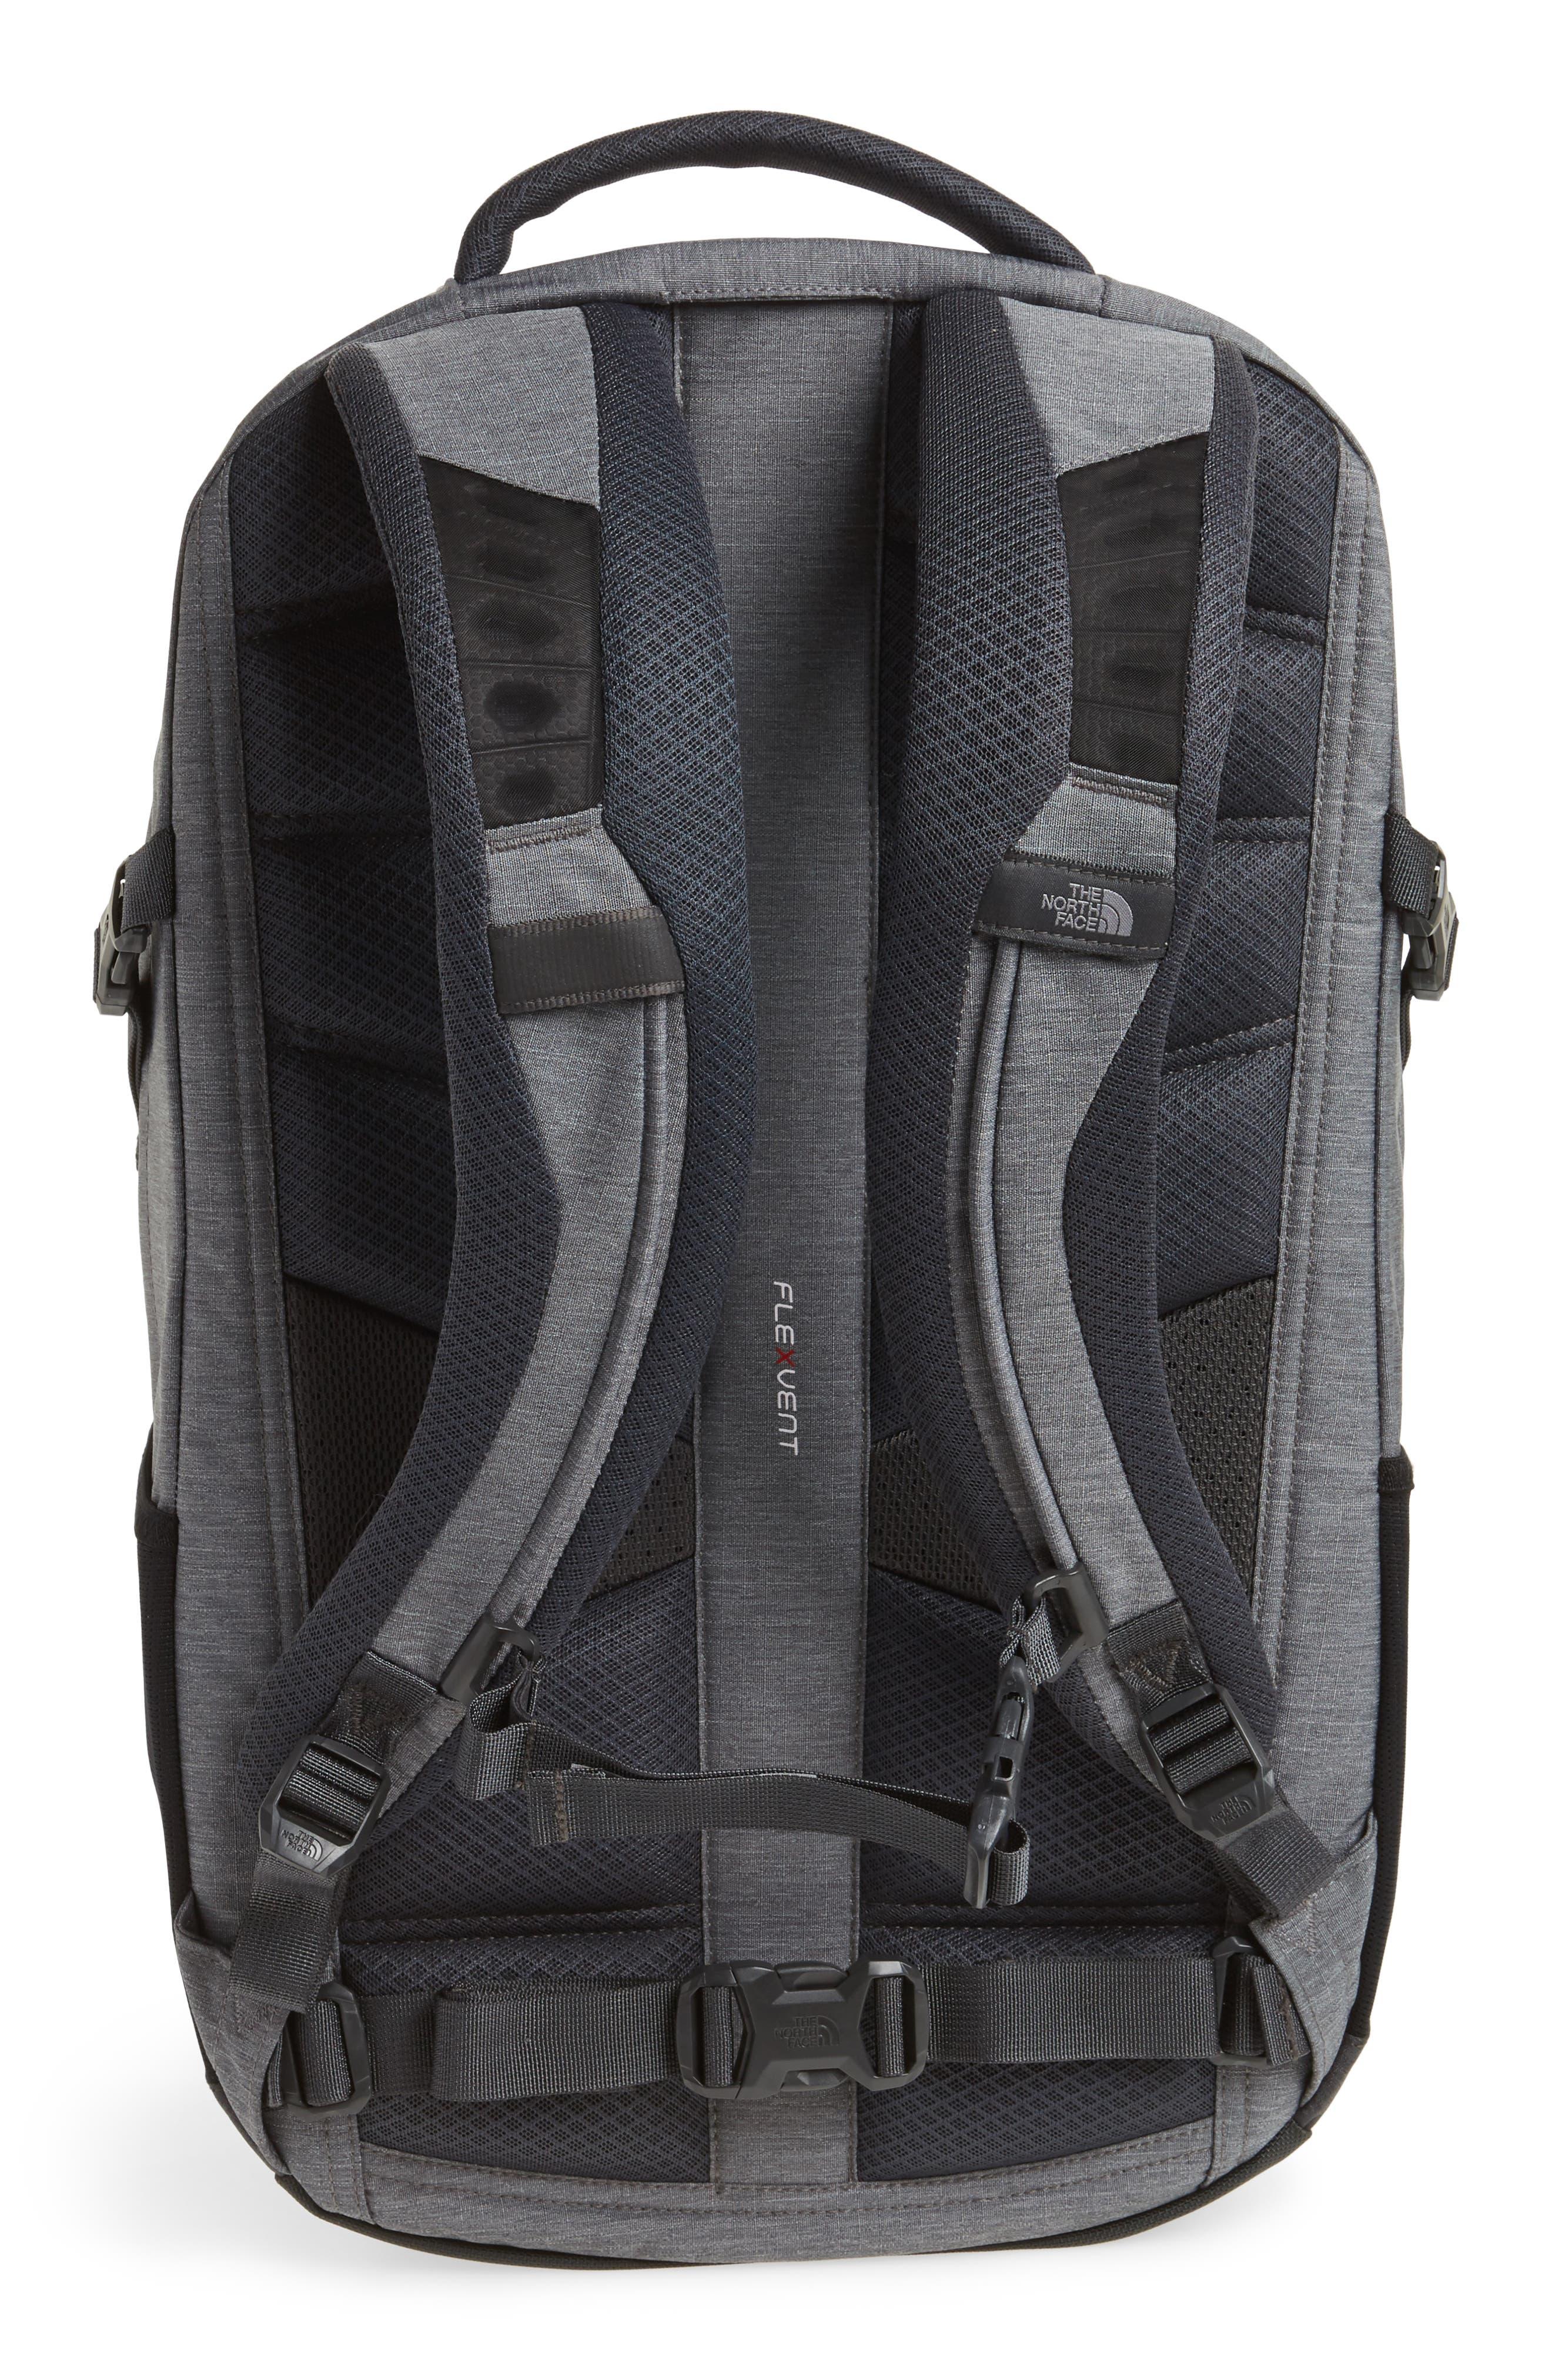 Hot Shot Backpack,                             Alternate thumbnail 3, color,                             021